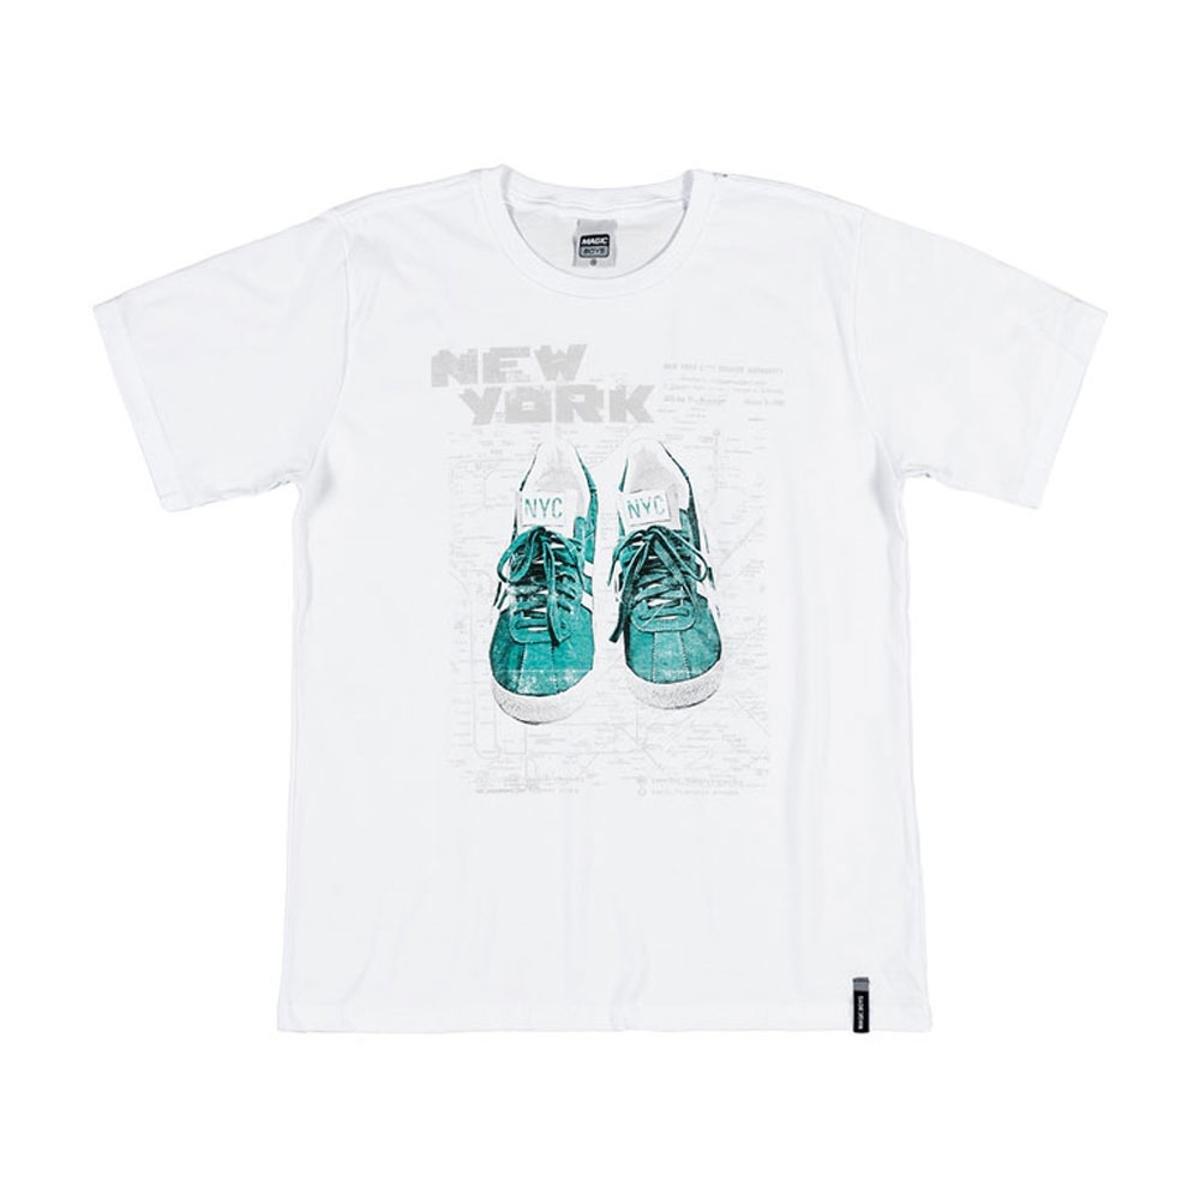 Camiseta Masculina Menino - Compre Agora  1014846bce7f0